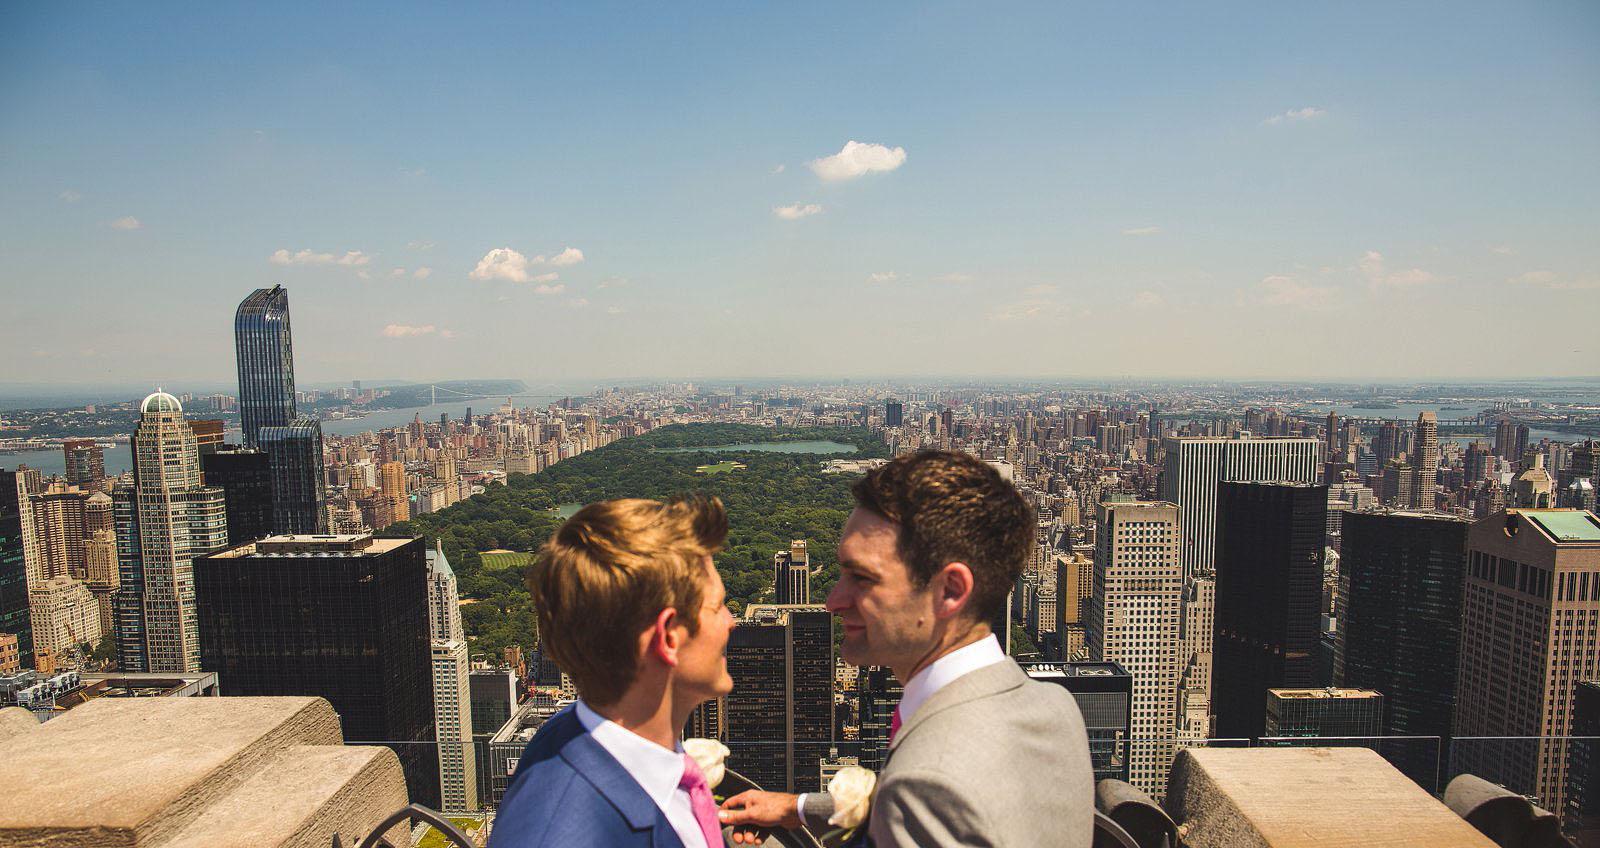 Wedding S New York City : Rockefeller center wedding in new york city